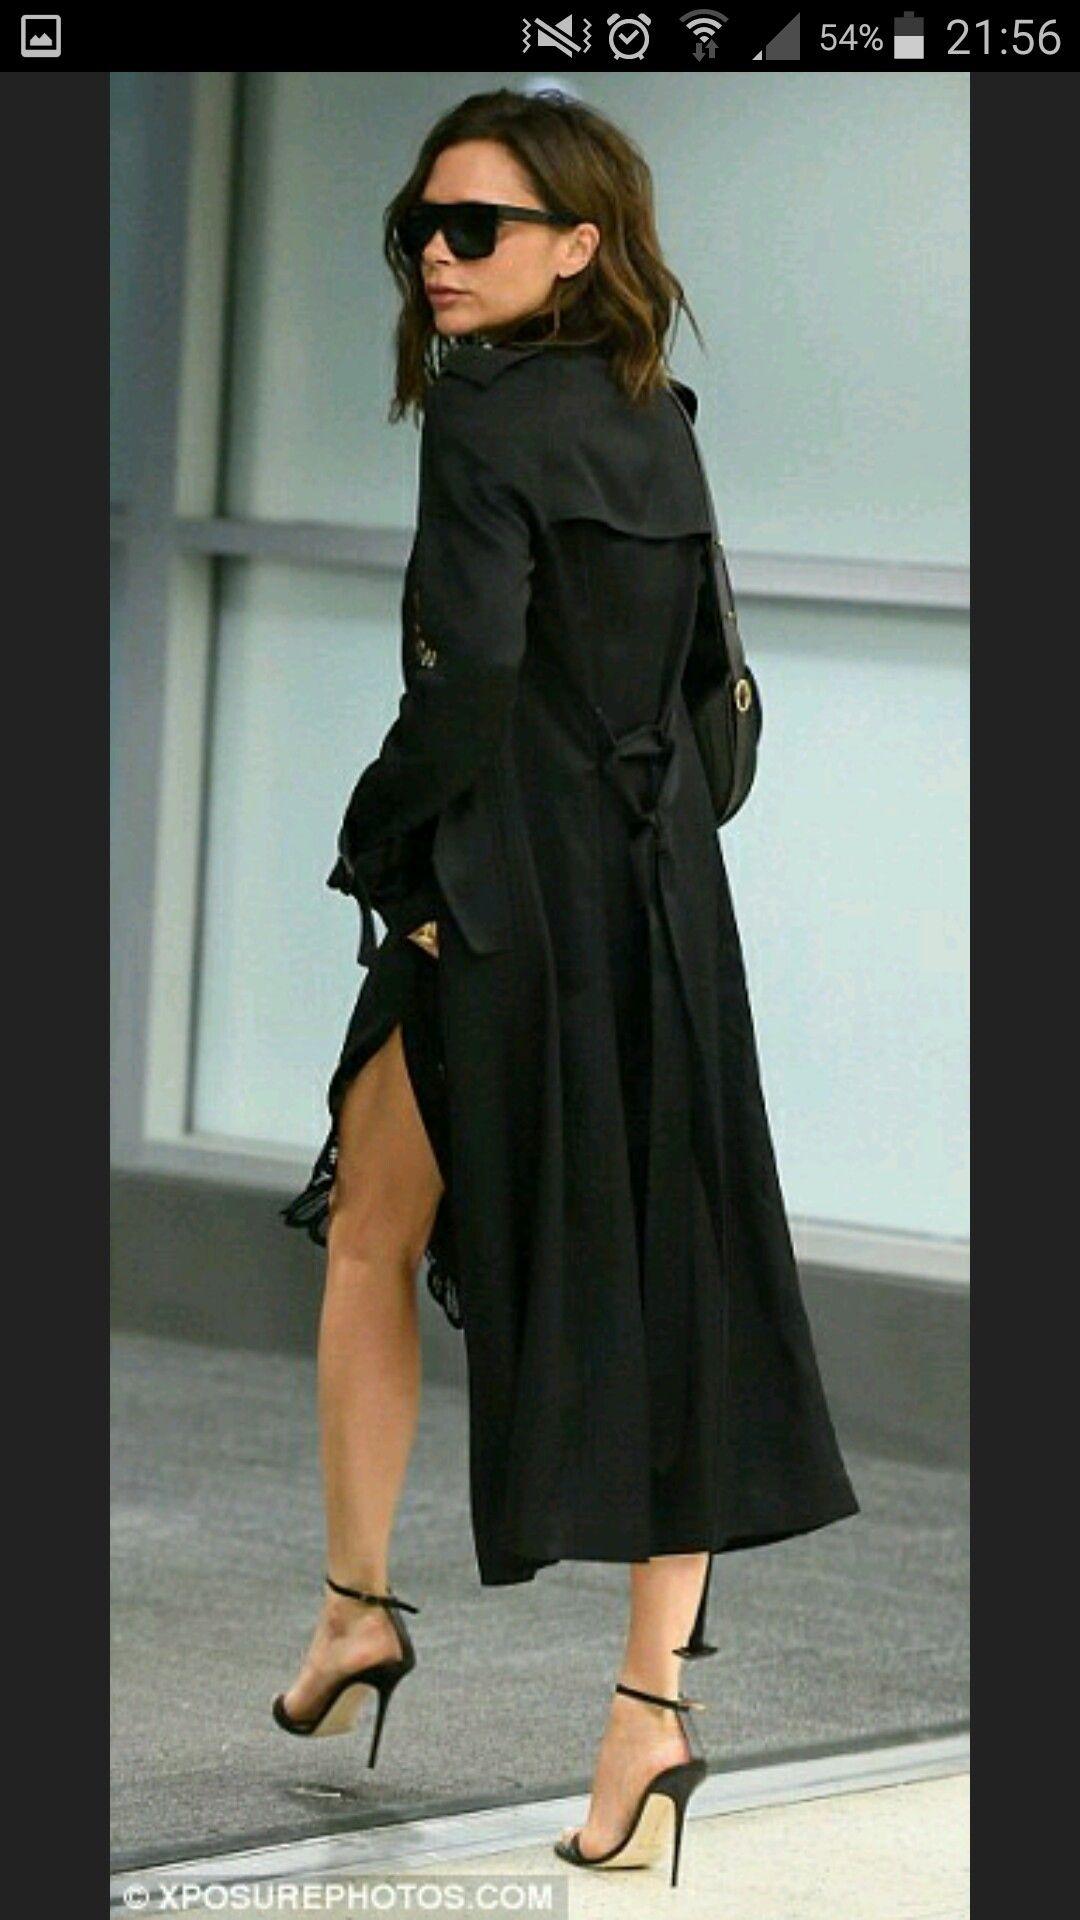 Pin By Rupali Mehta On Vip Victoria Fashion Victoria Beckham Style Victoria Beckham Sunglasses [ 1920 x 1080 Pixel ]